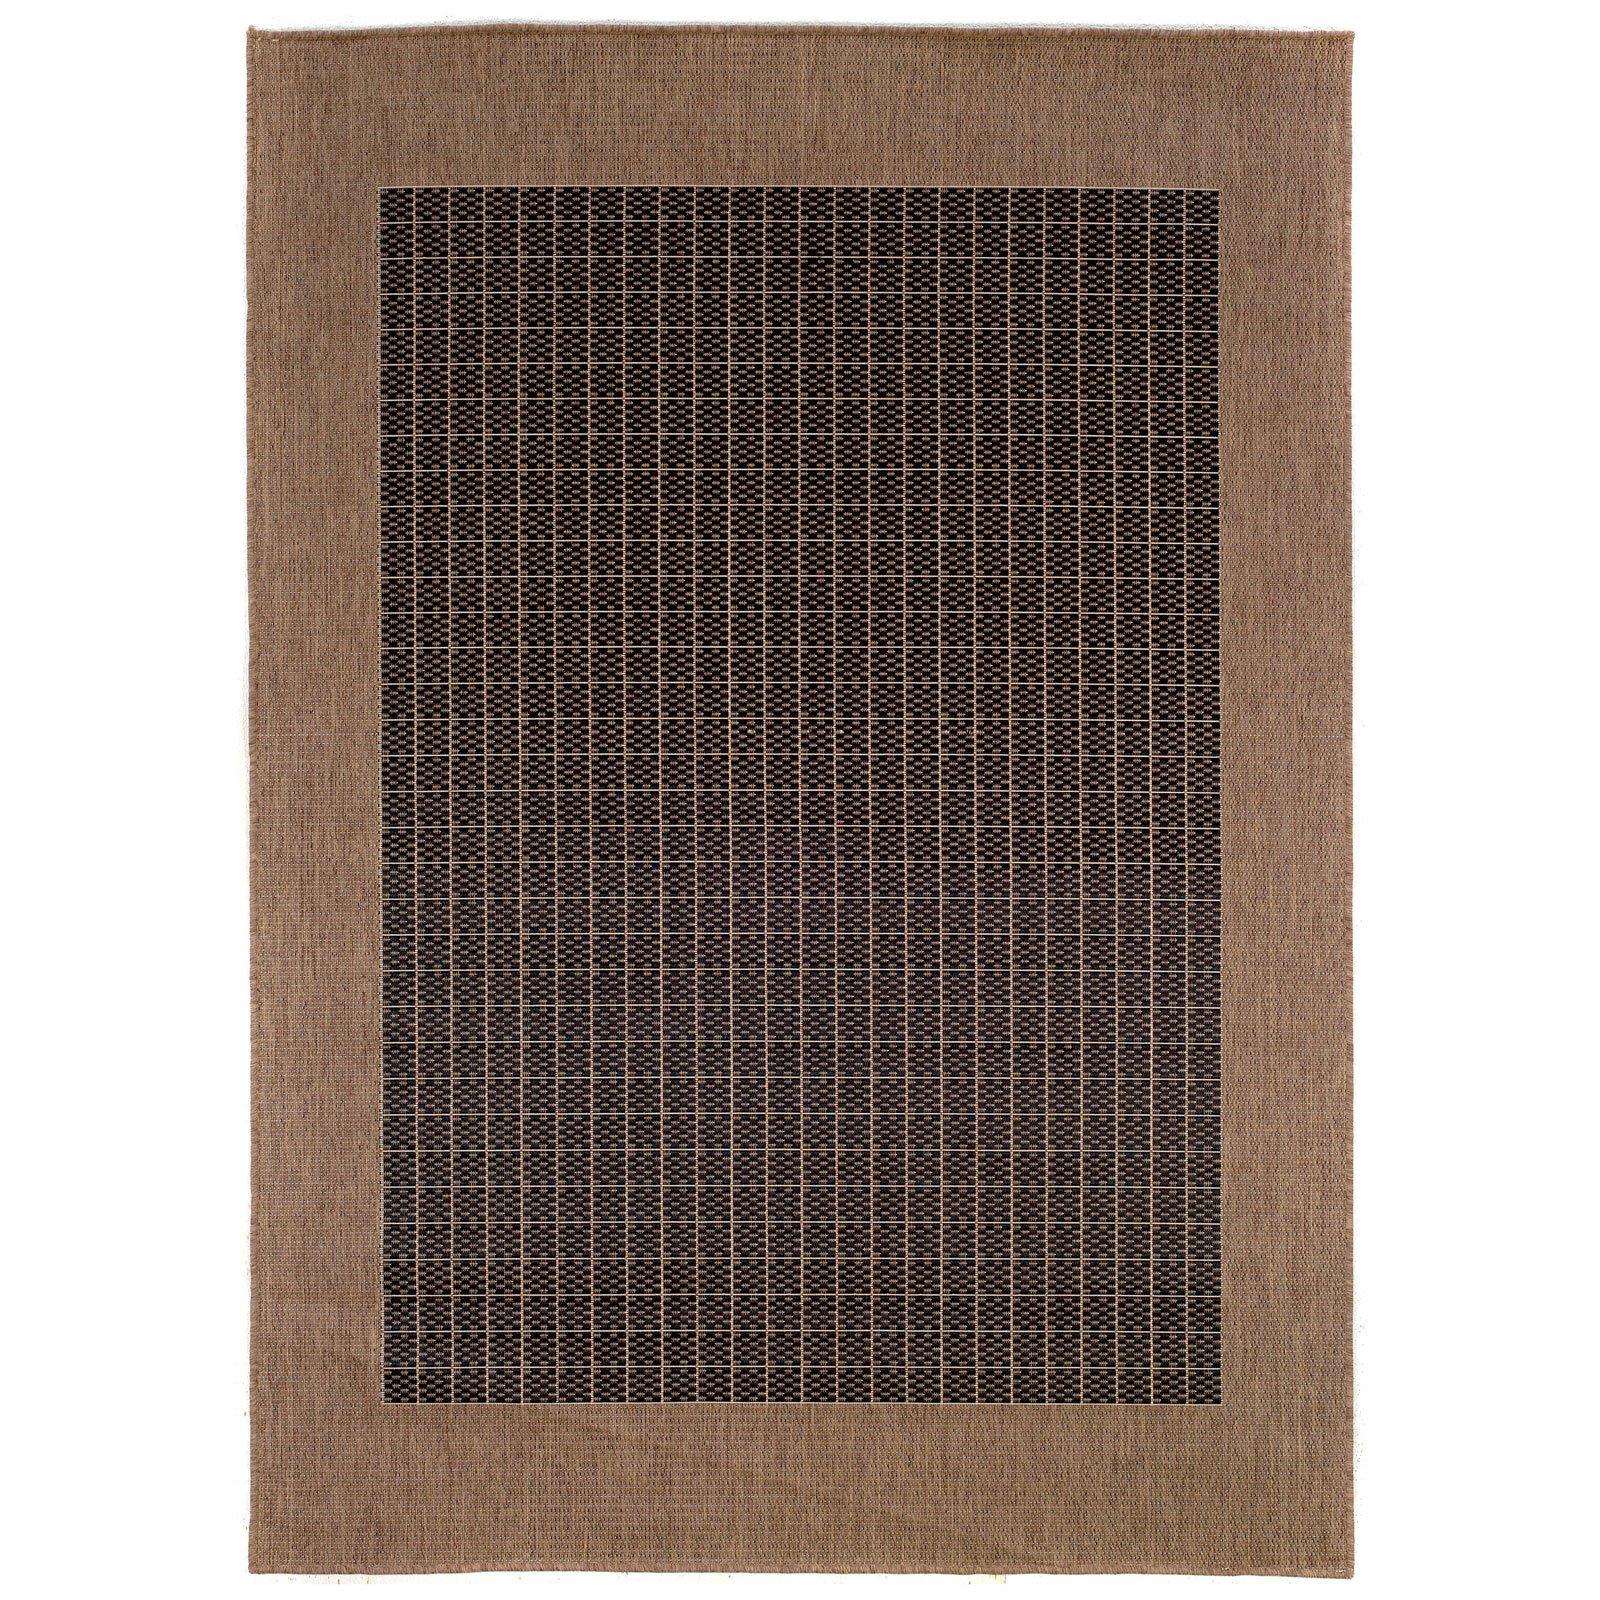 Couristan Recife Checkered Field Rug, Black/Cocoa